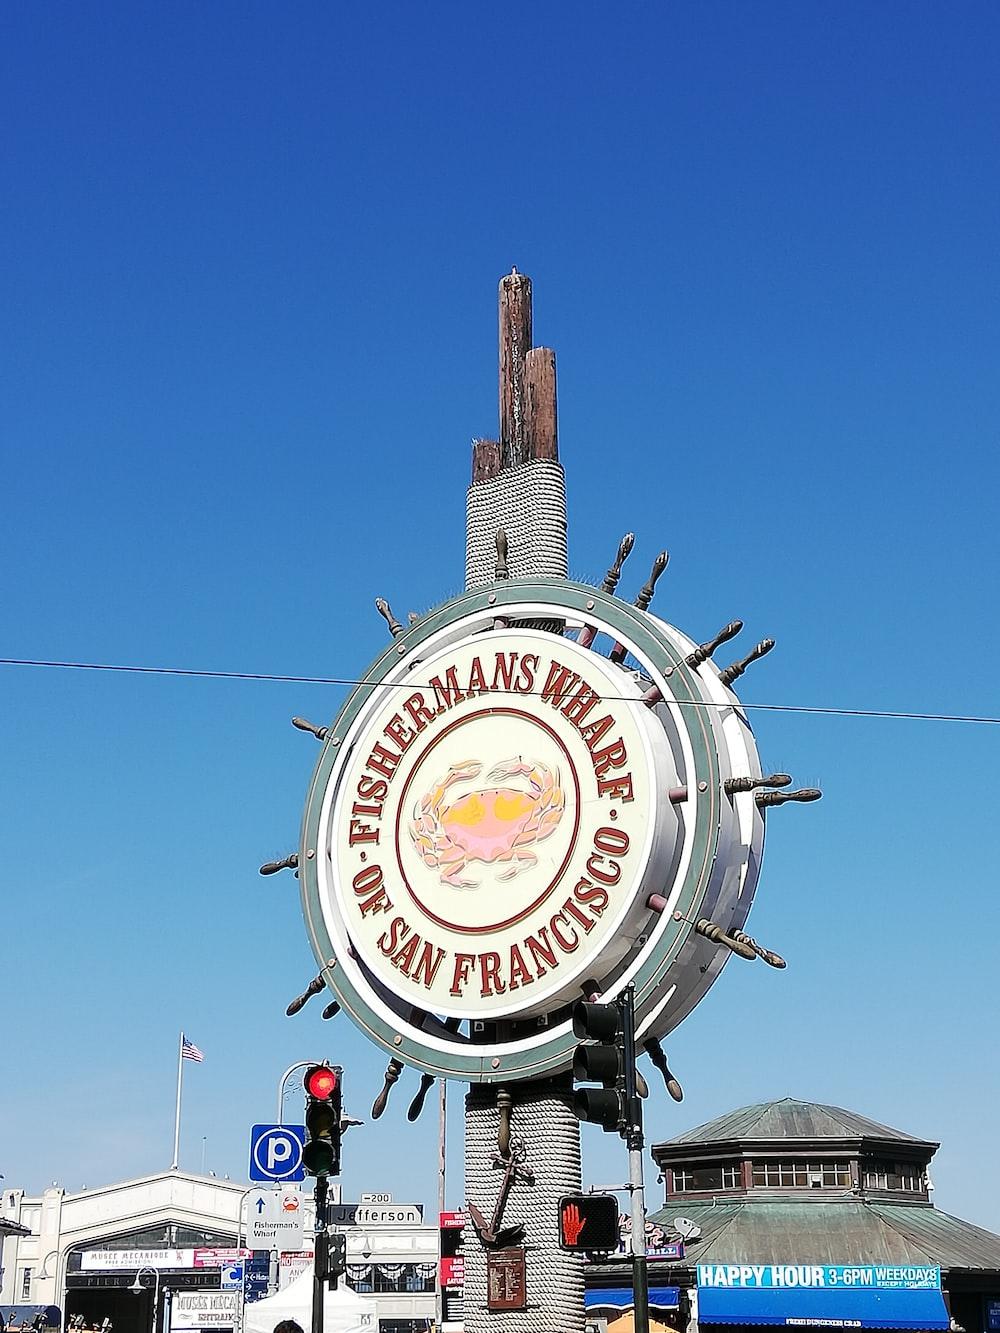 Fishermans Wharf signage